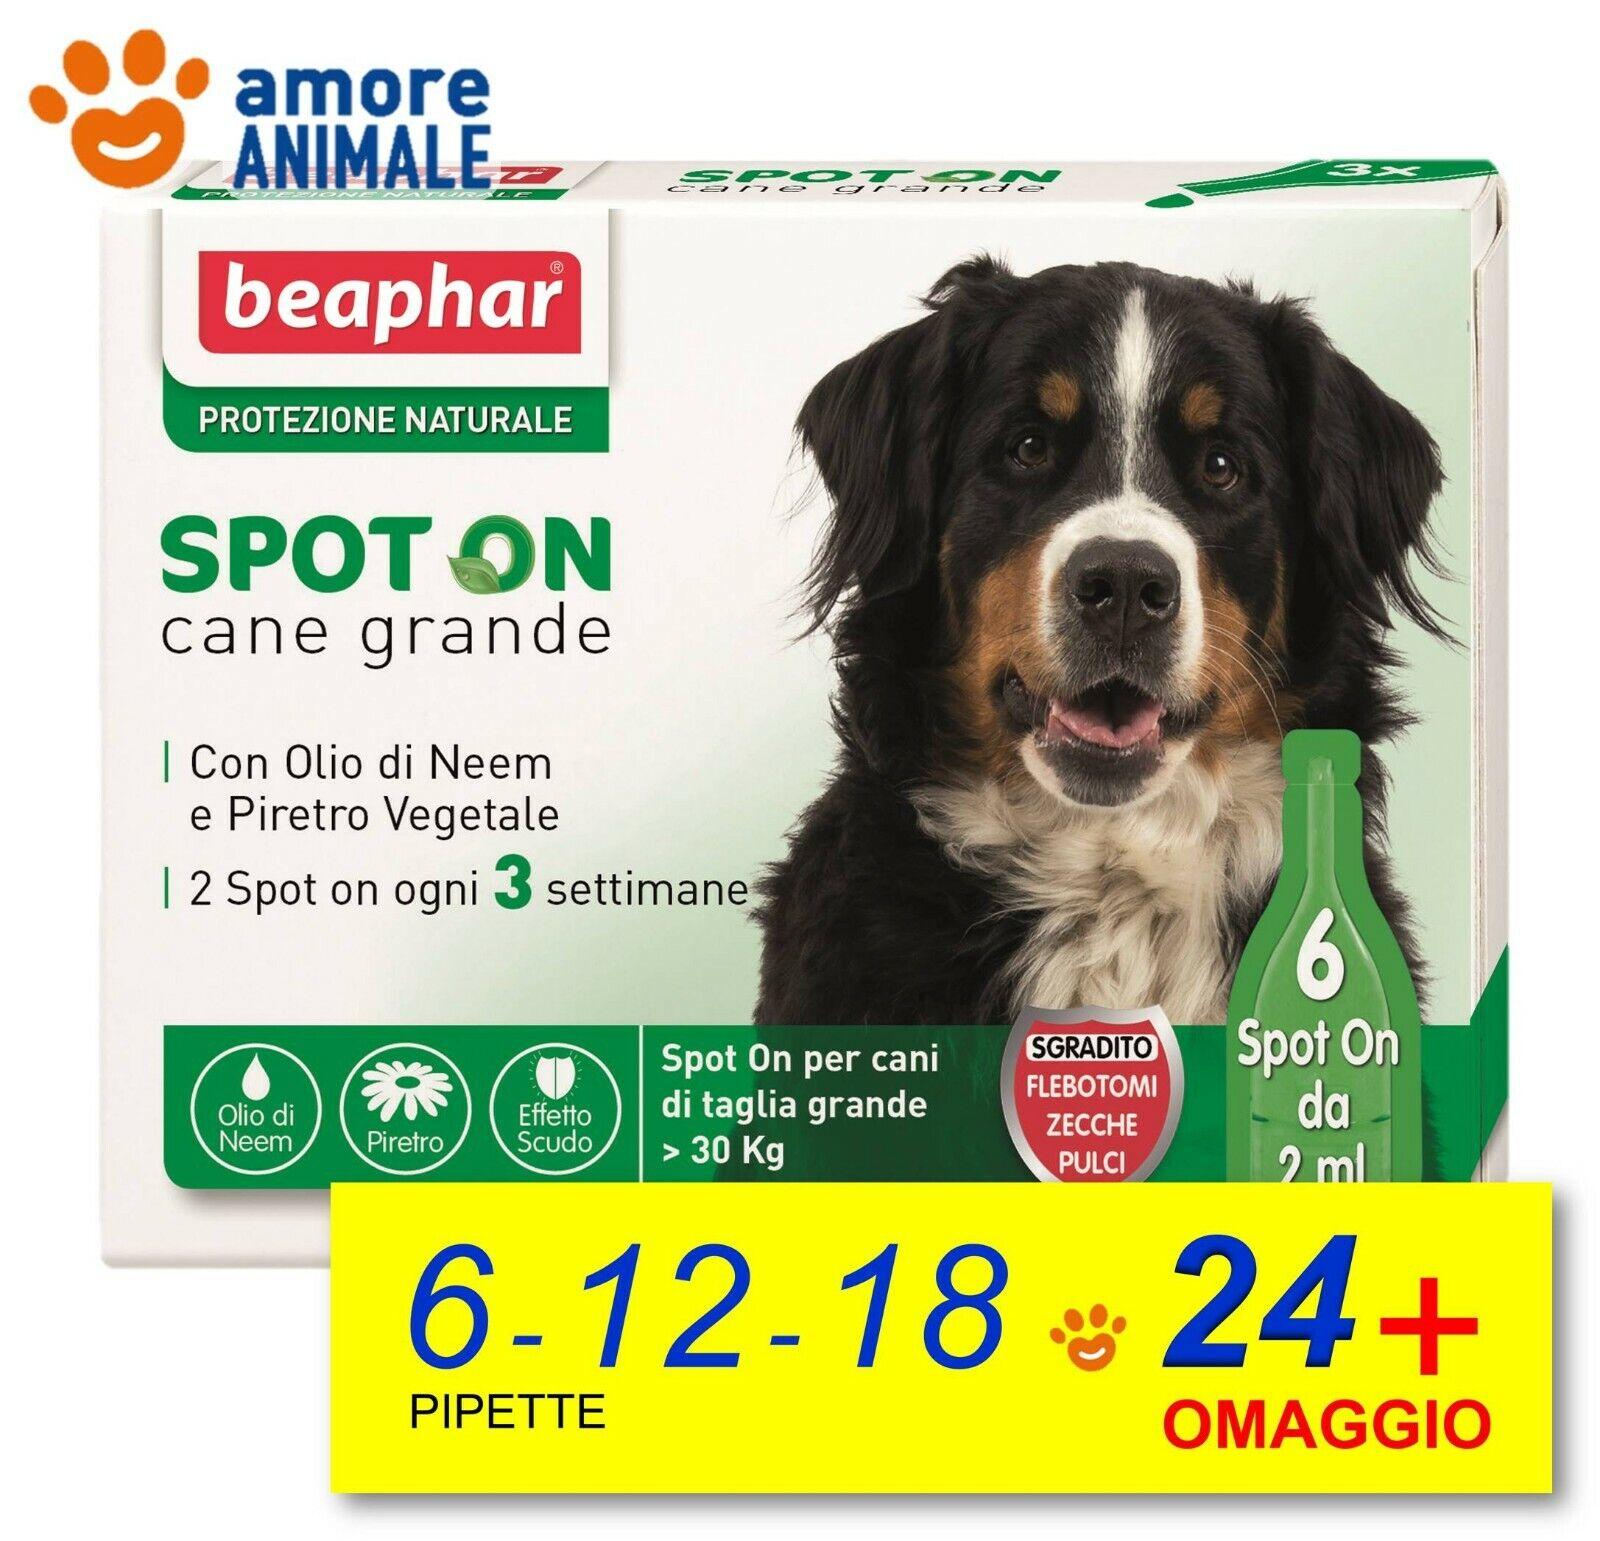 Beaphar Spot On Protezione Naturale Cane Grande oltre 30 kg 6  12  18  24 pip